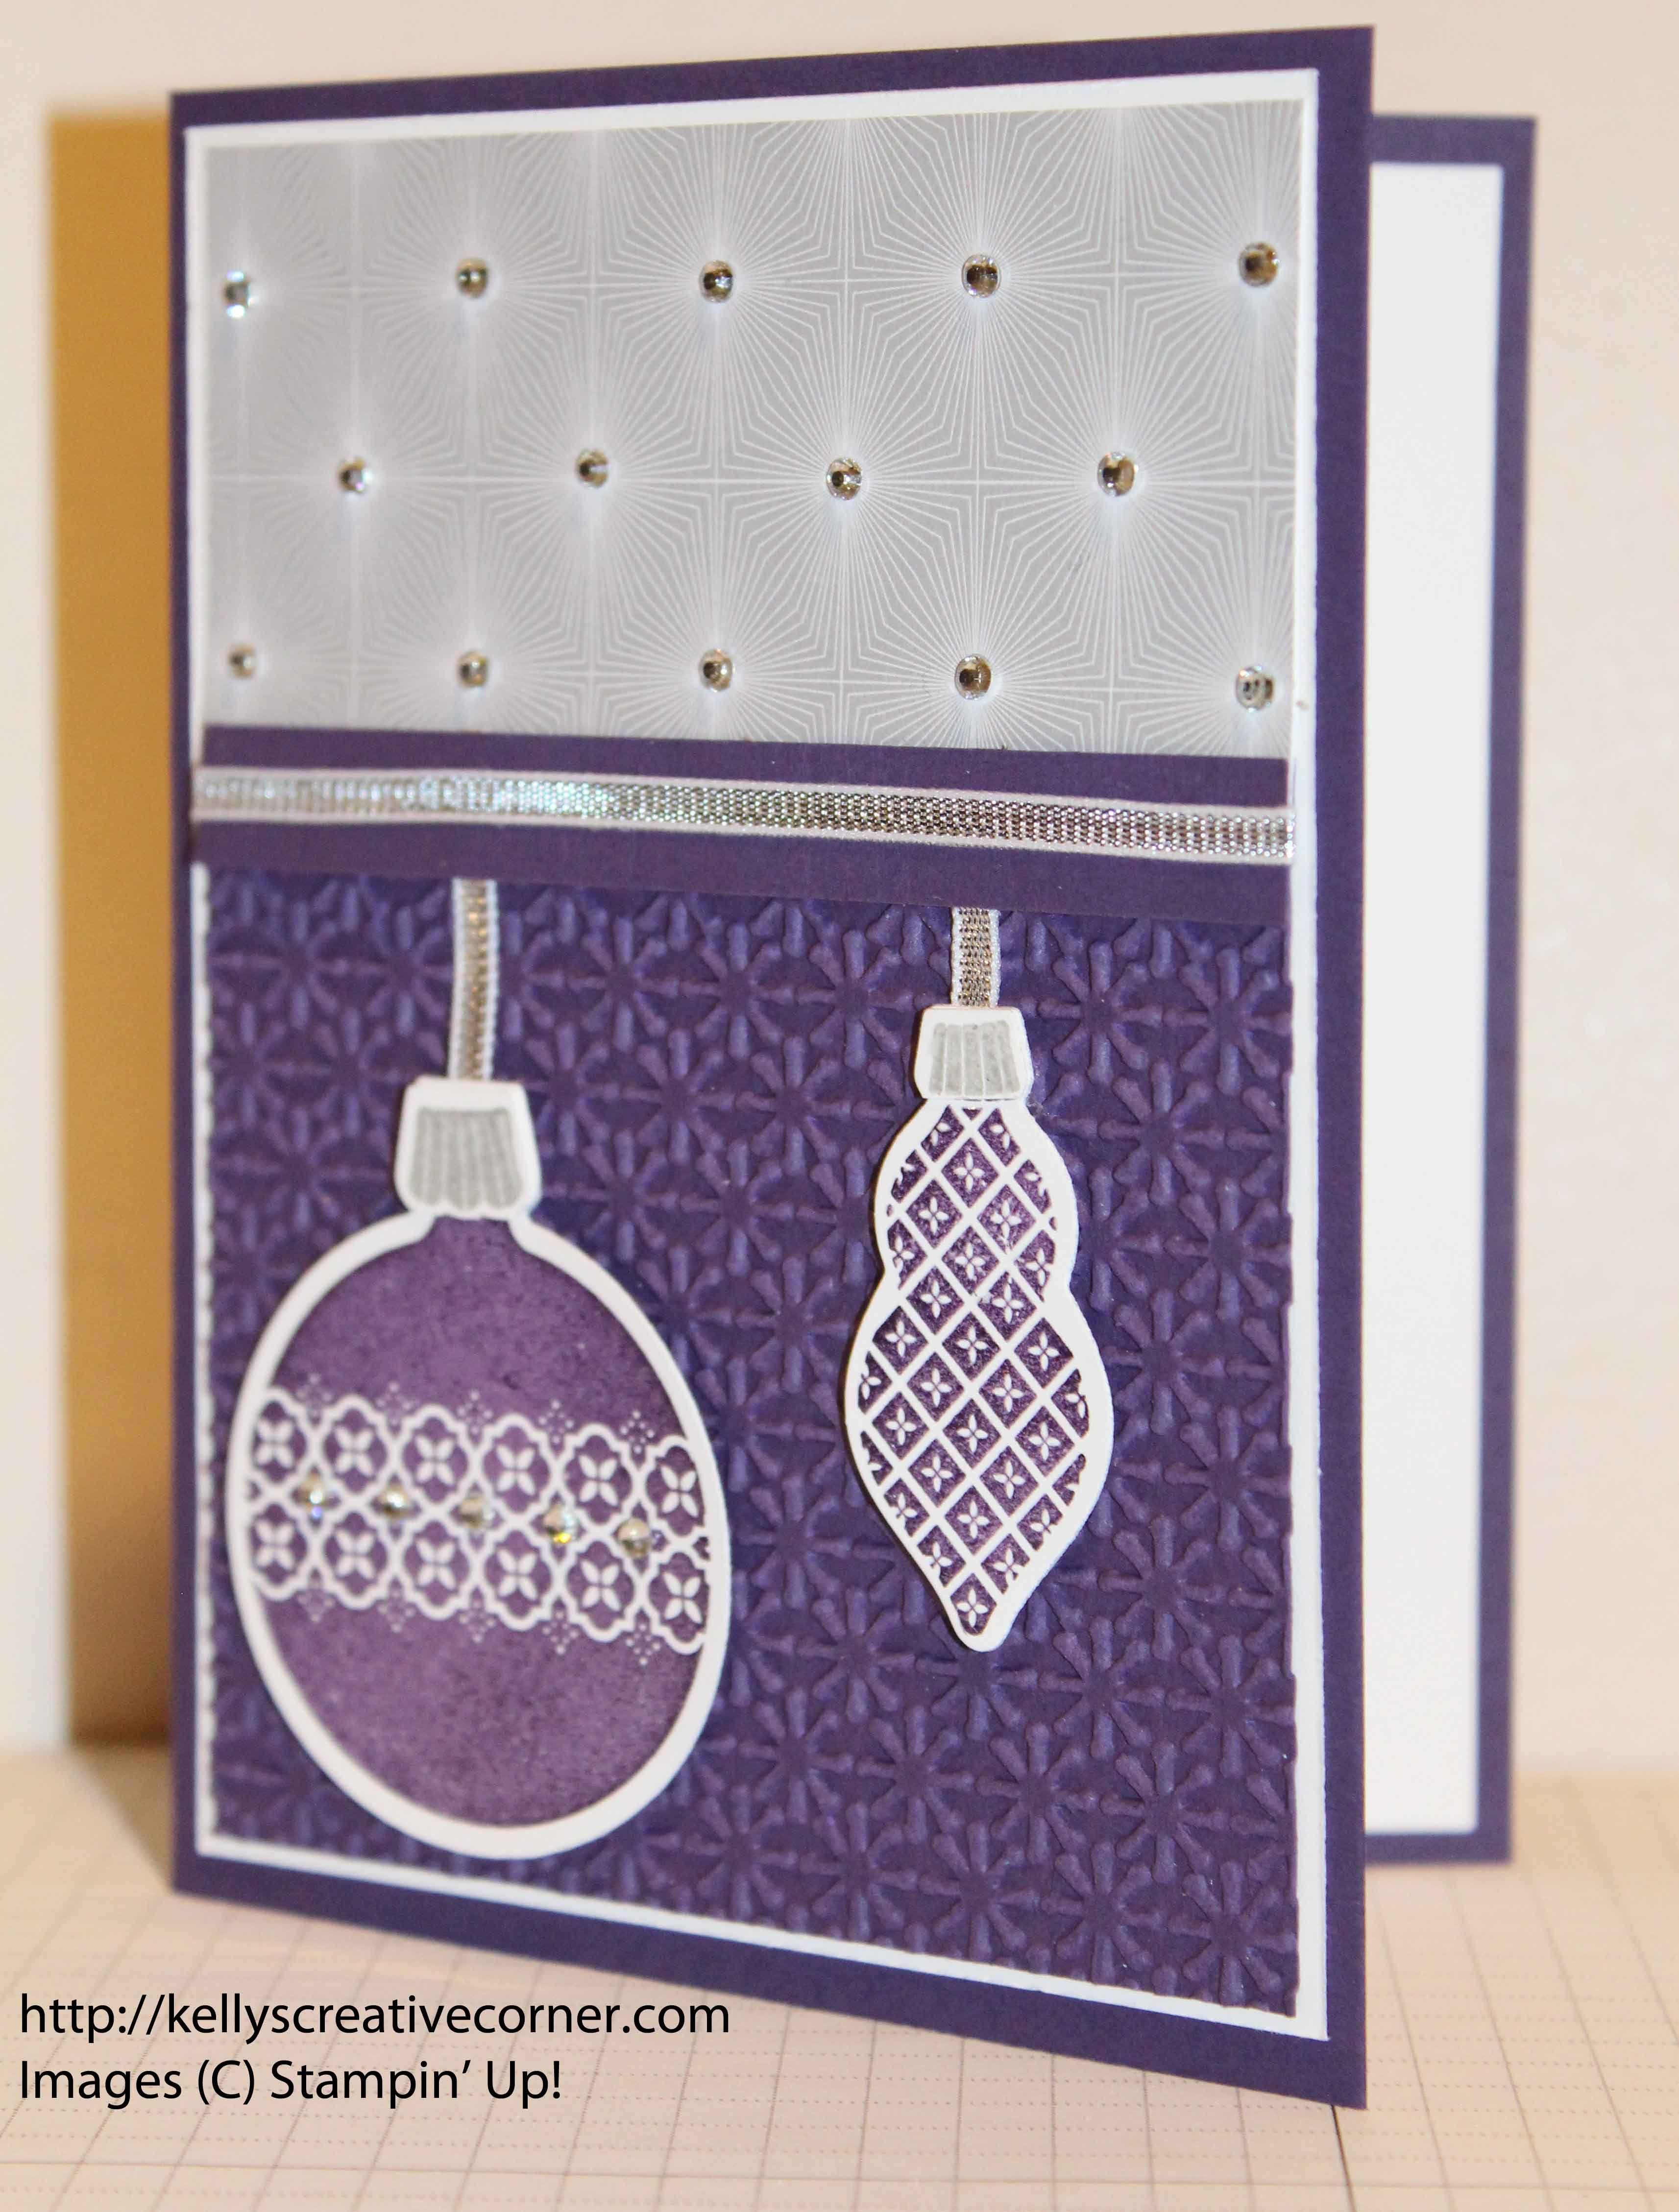 Pin By Kelly U0026 39 S Creative Corner On Kelly Detommaso U0026 39 S Cards